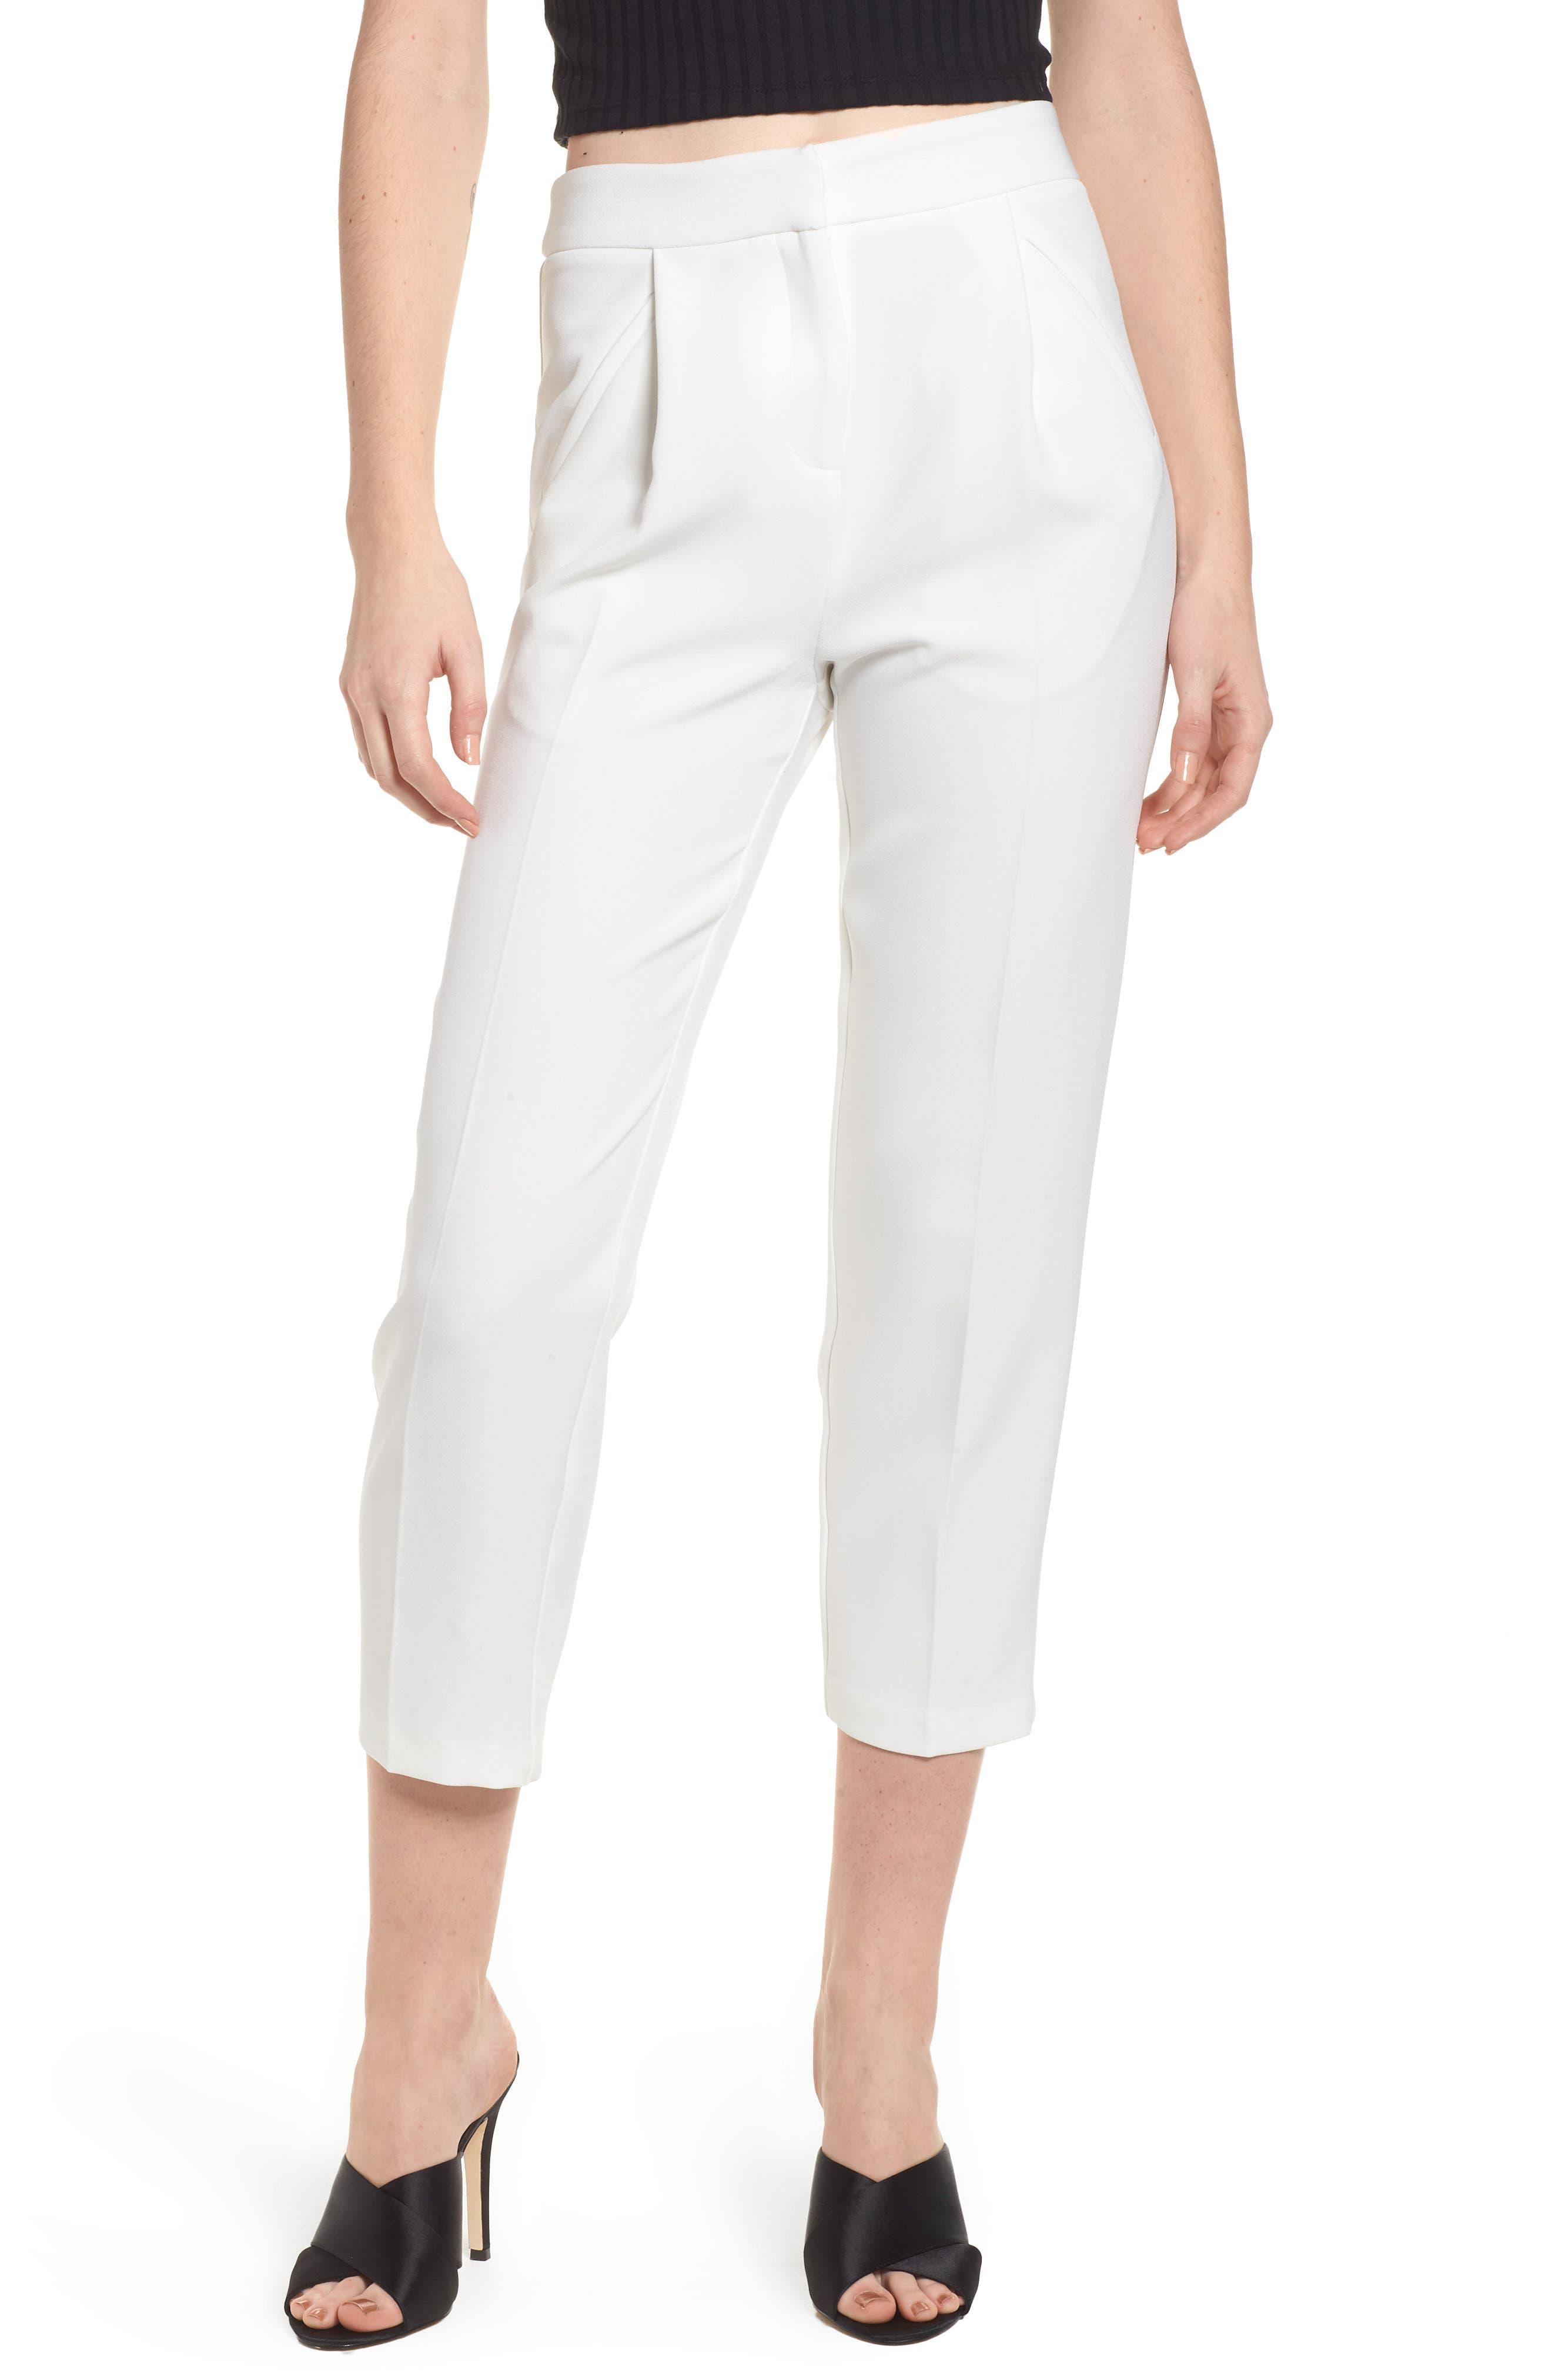 Alternate Image 1 Selected - Topshop Clean Pocket Peg Trousers